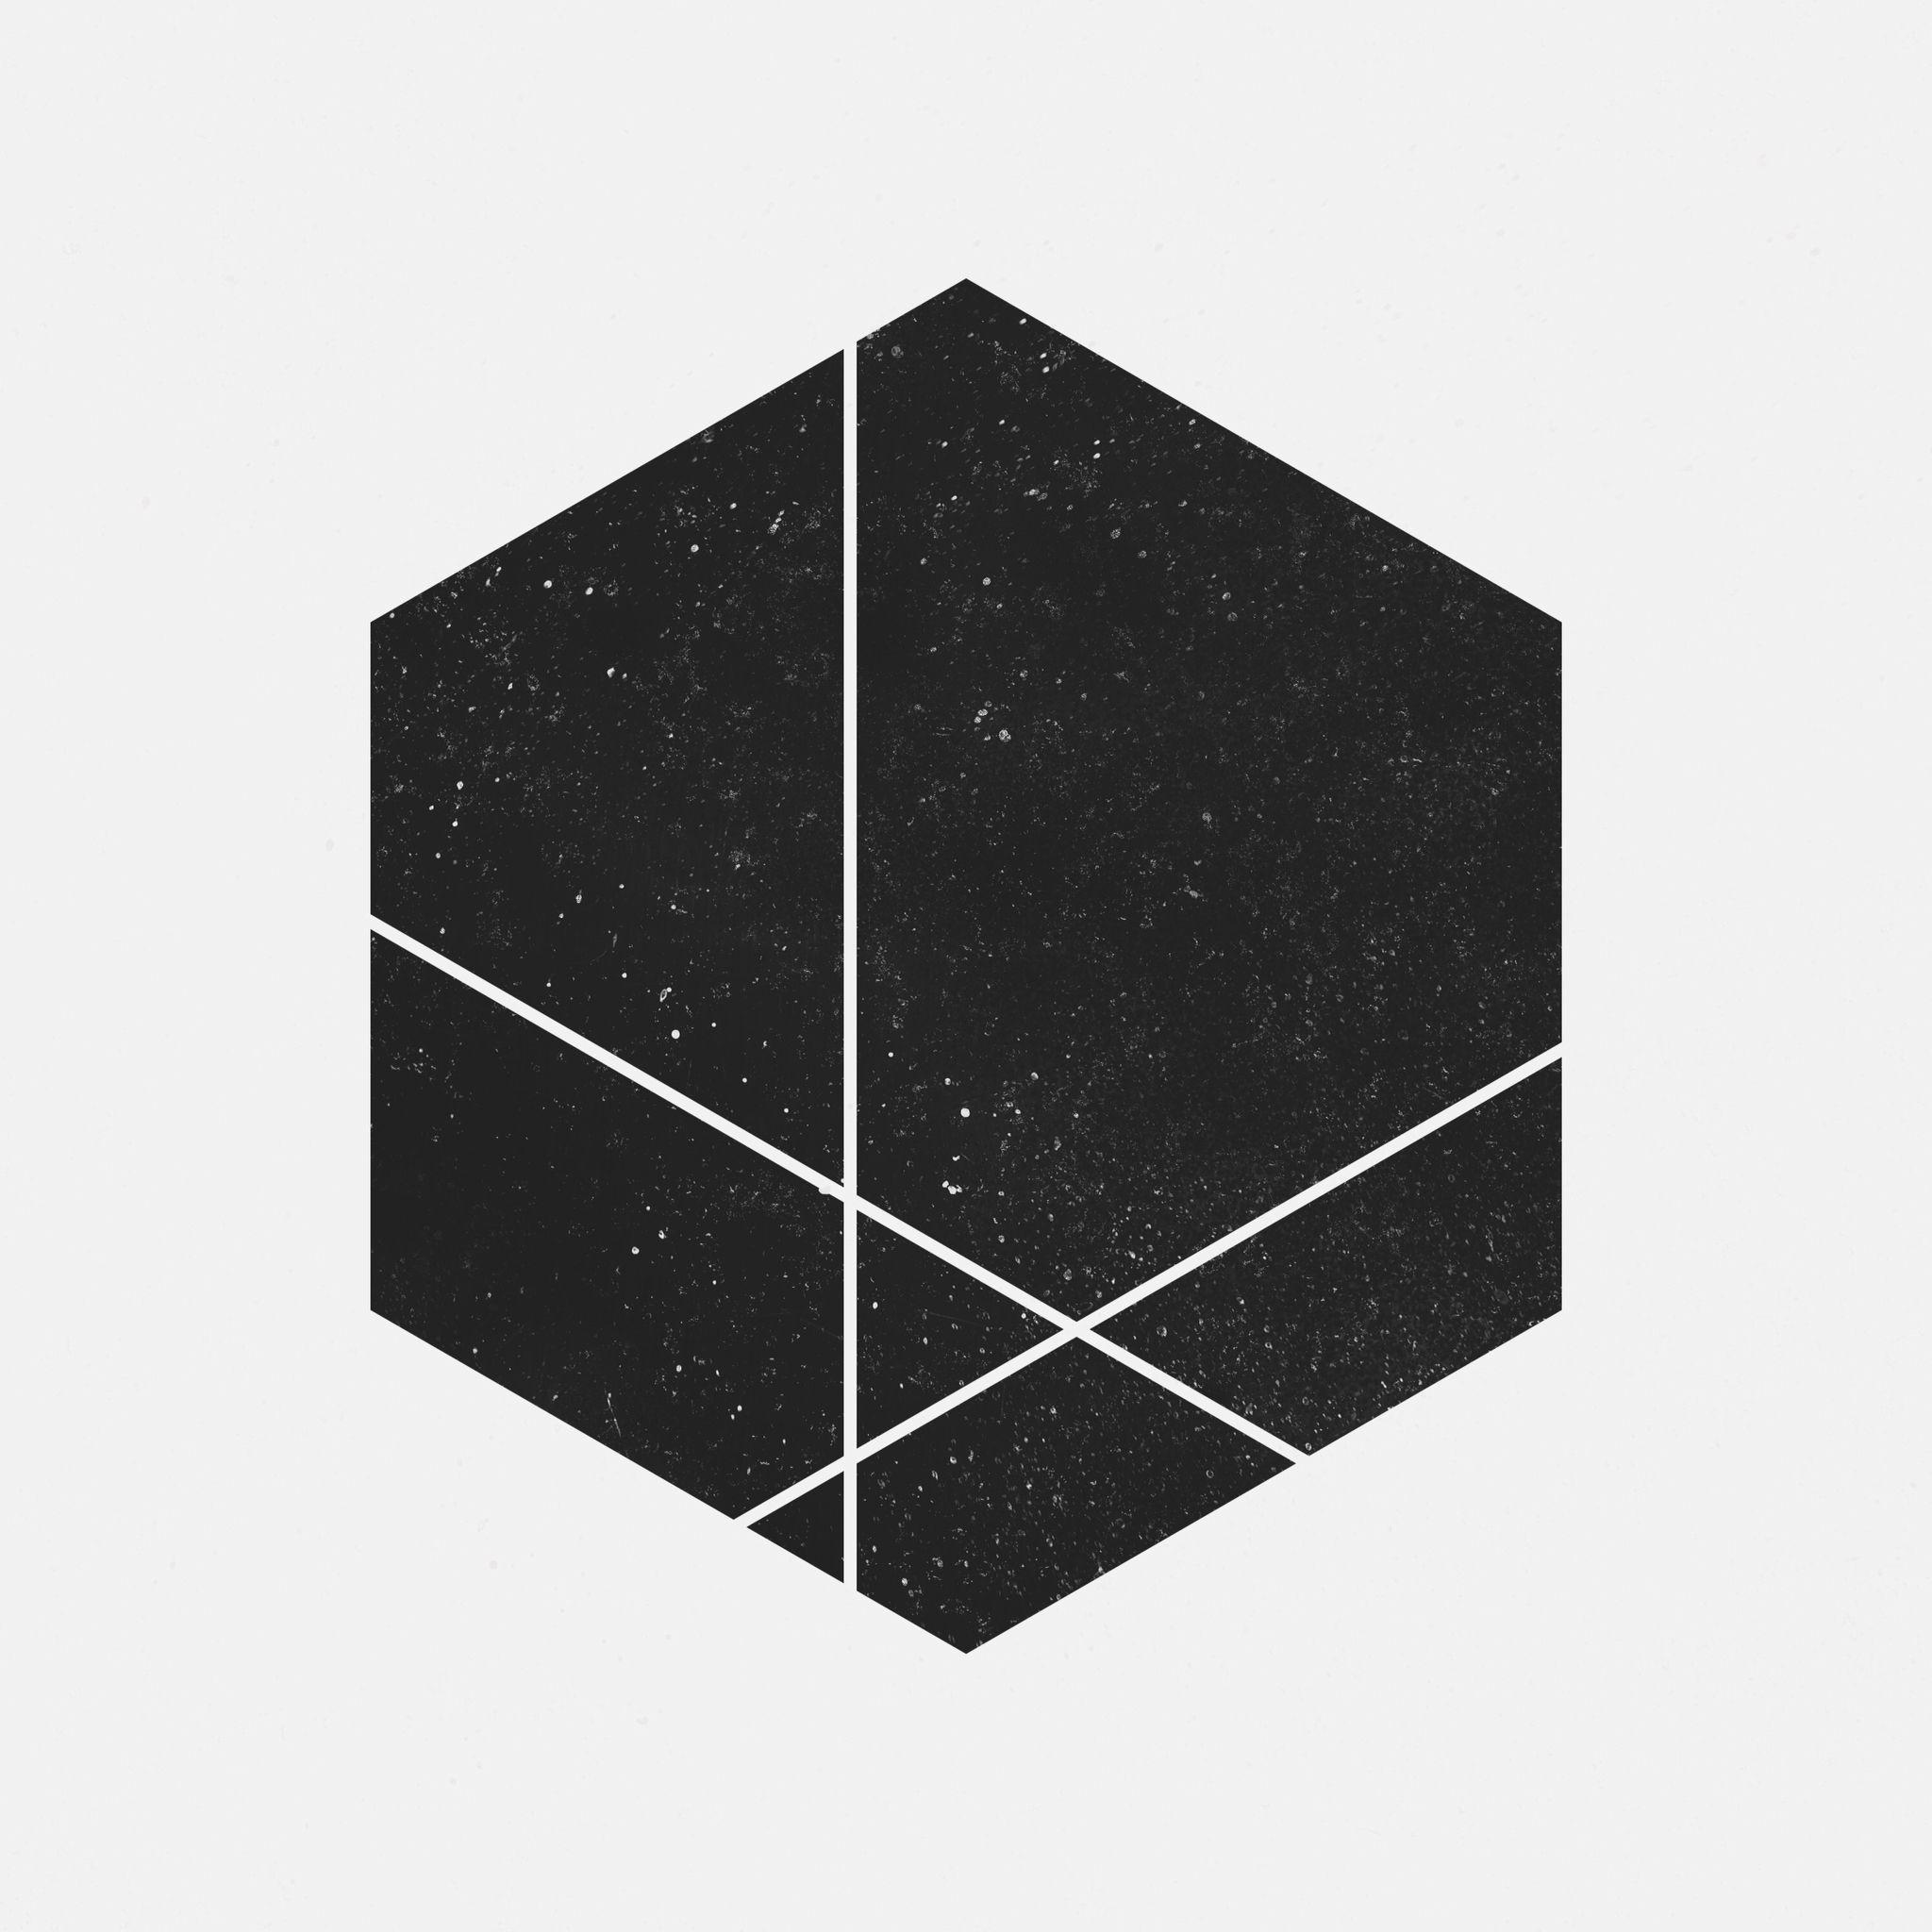 Ma15 141 a new geometric design every day random for Minimal style